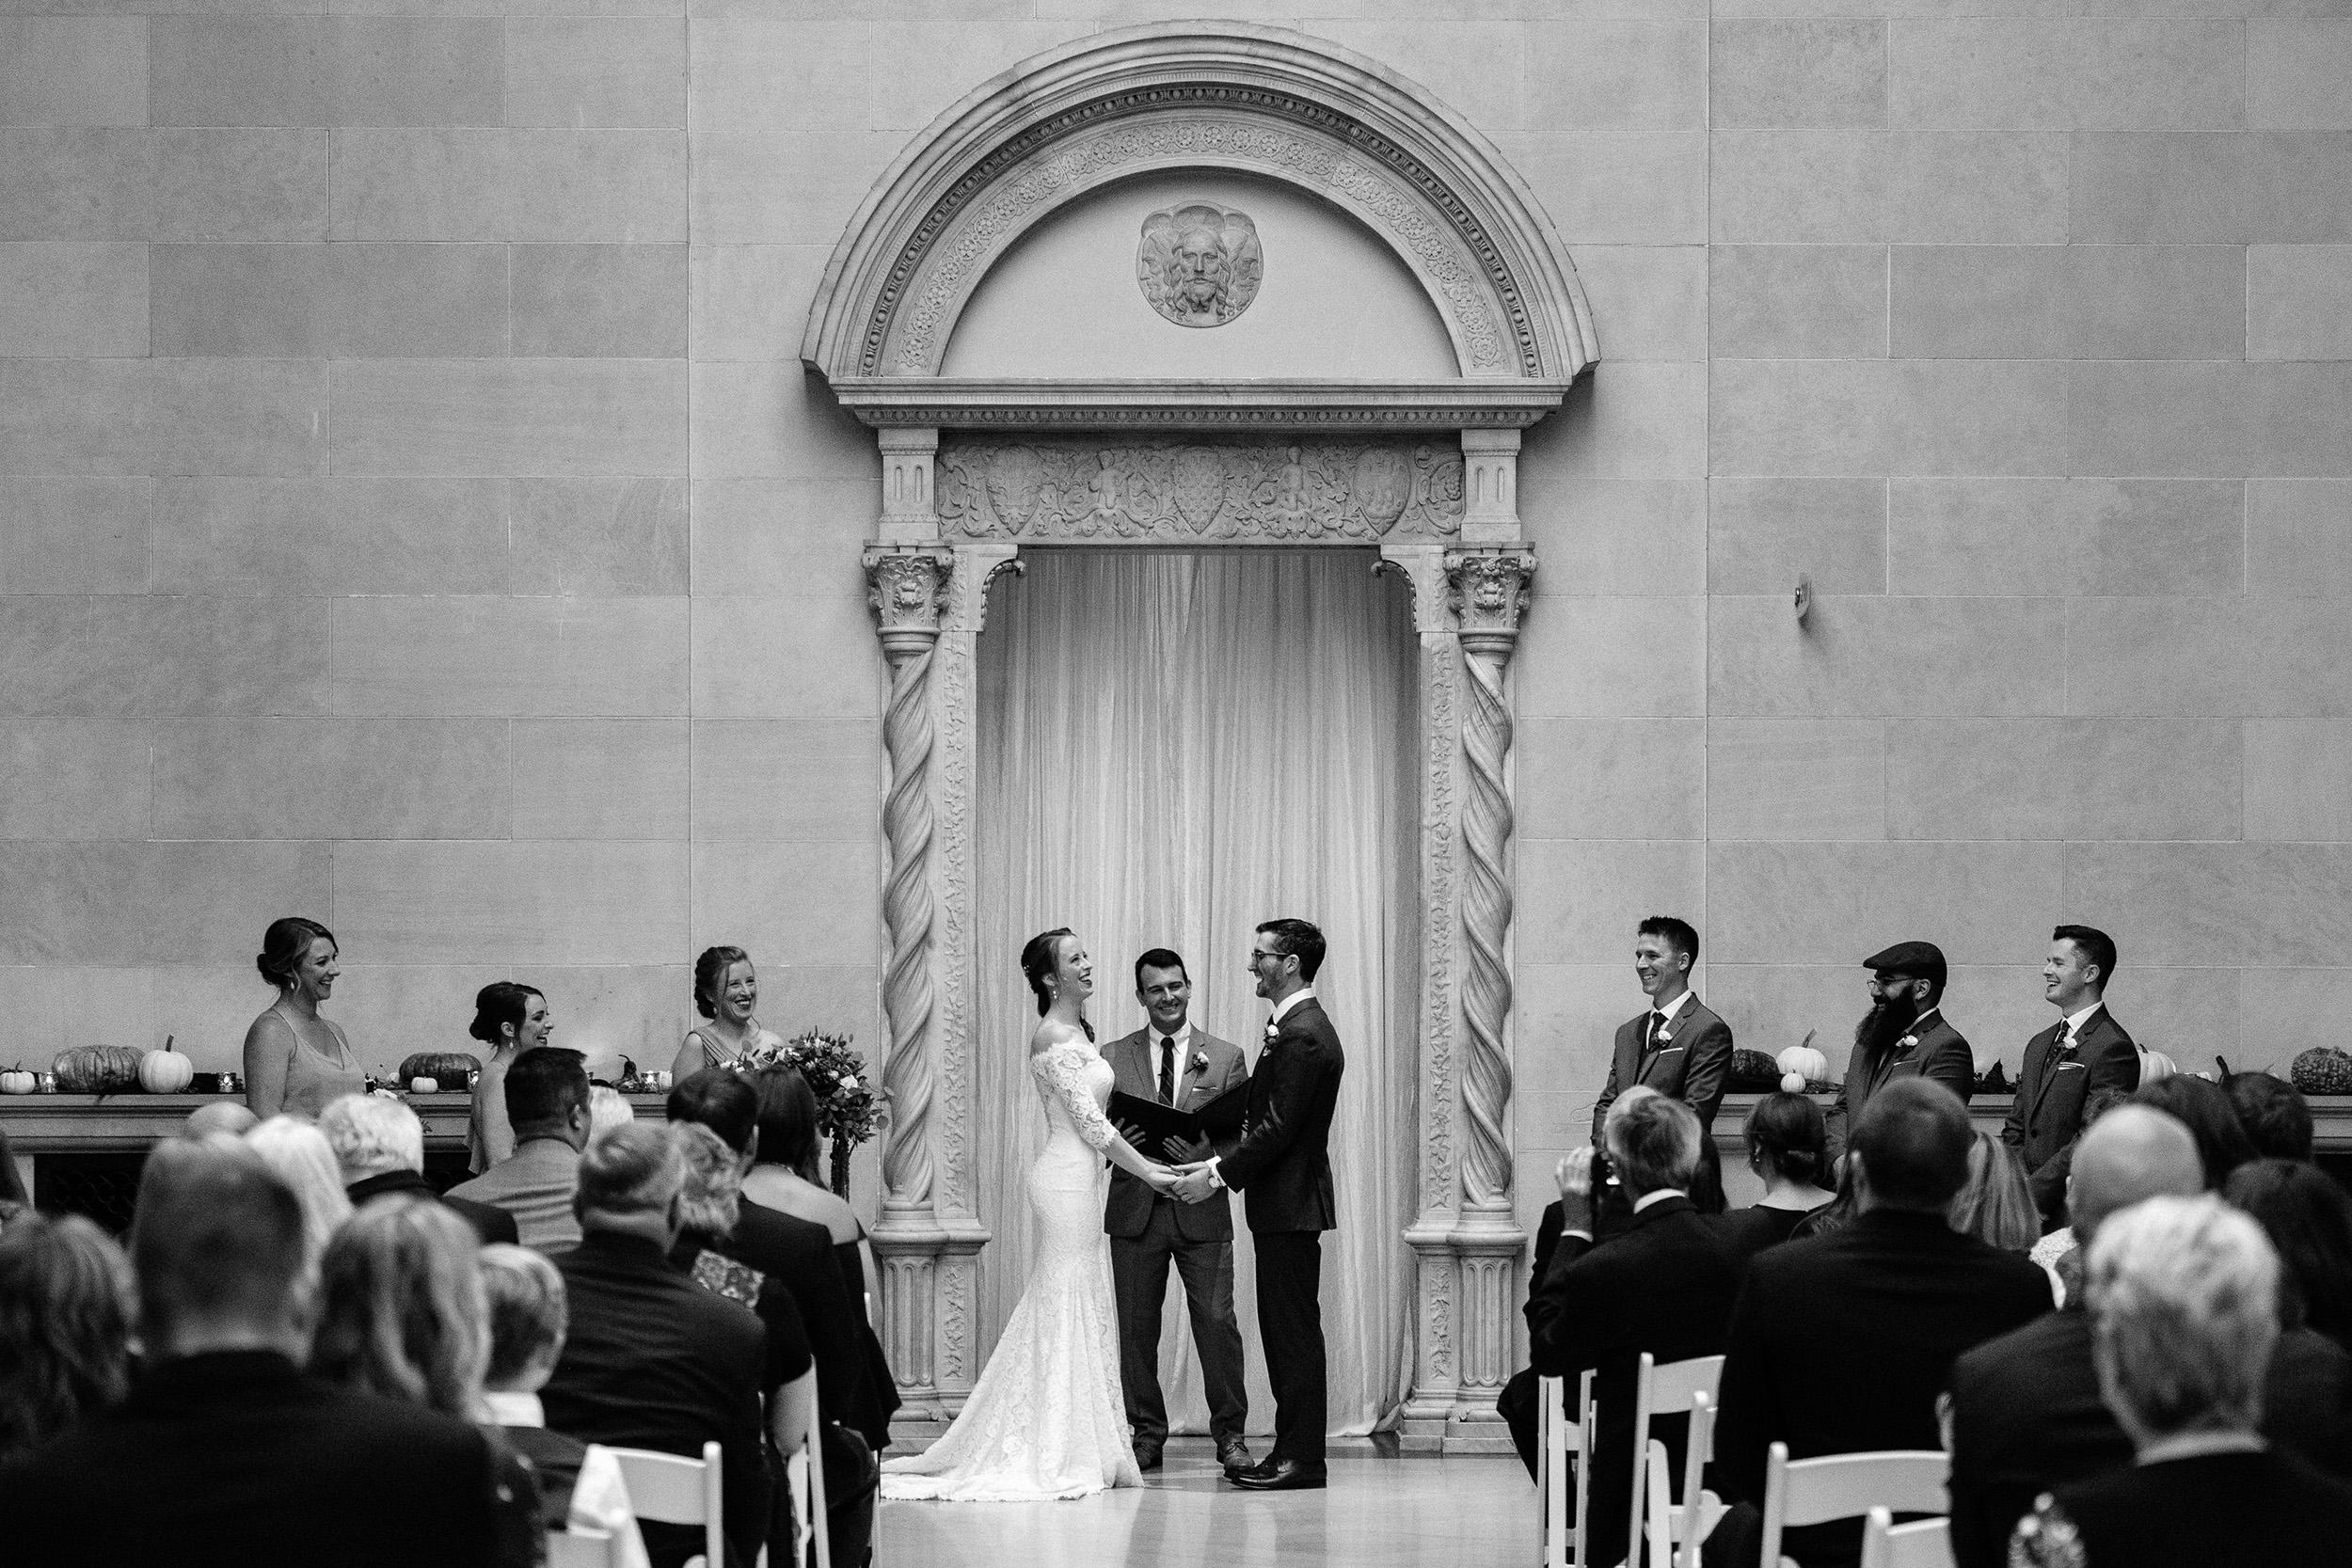 KarliCadel-Wedding-RachelChad-9932.jpg